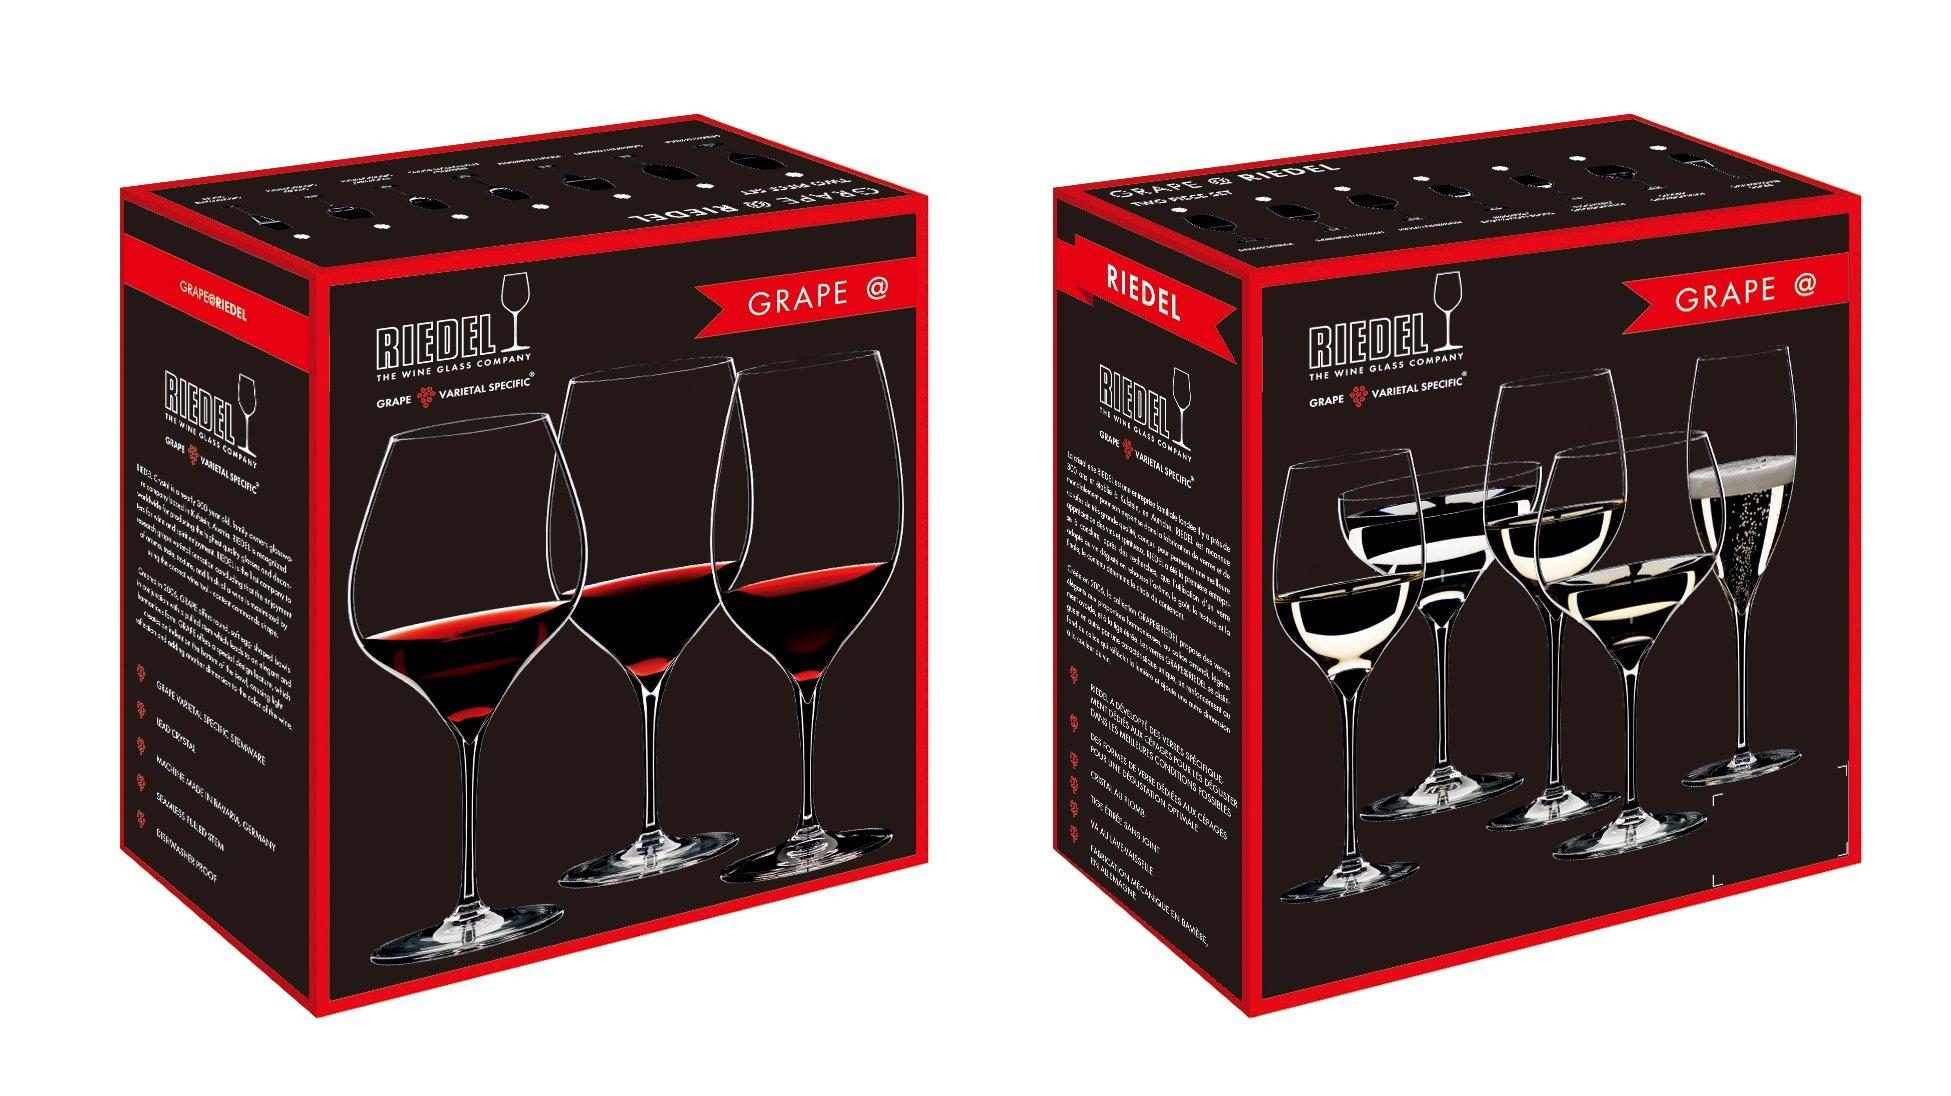 Riedel-640405-Grape-ViognierChardonnay-2-Glser